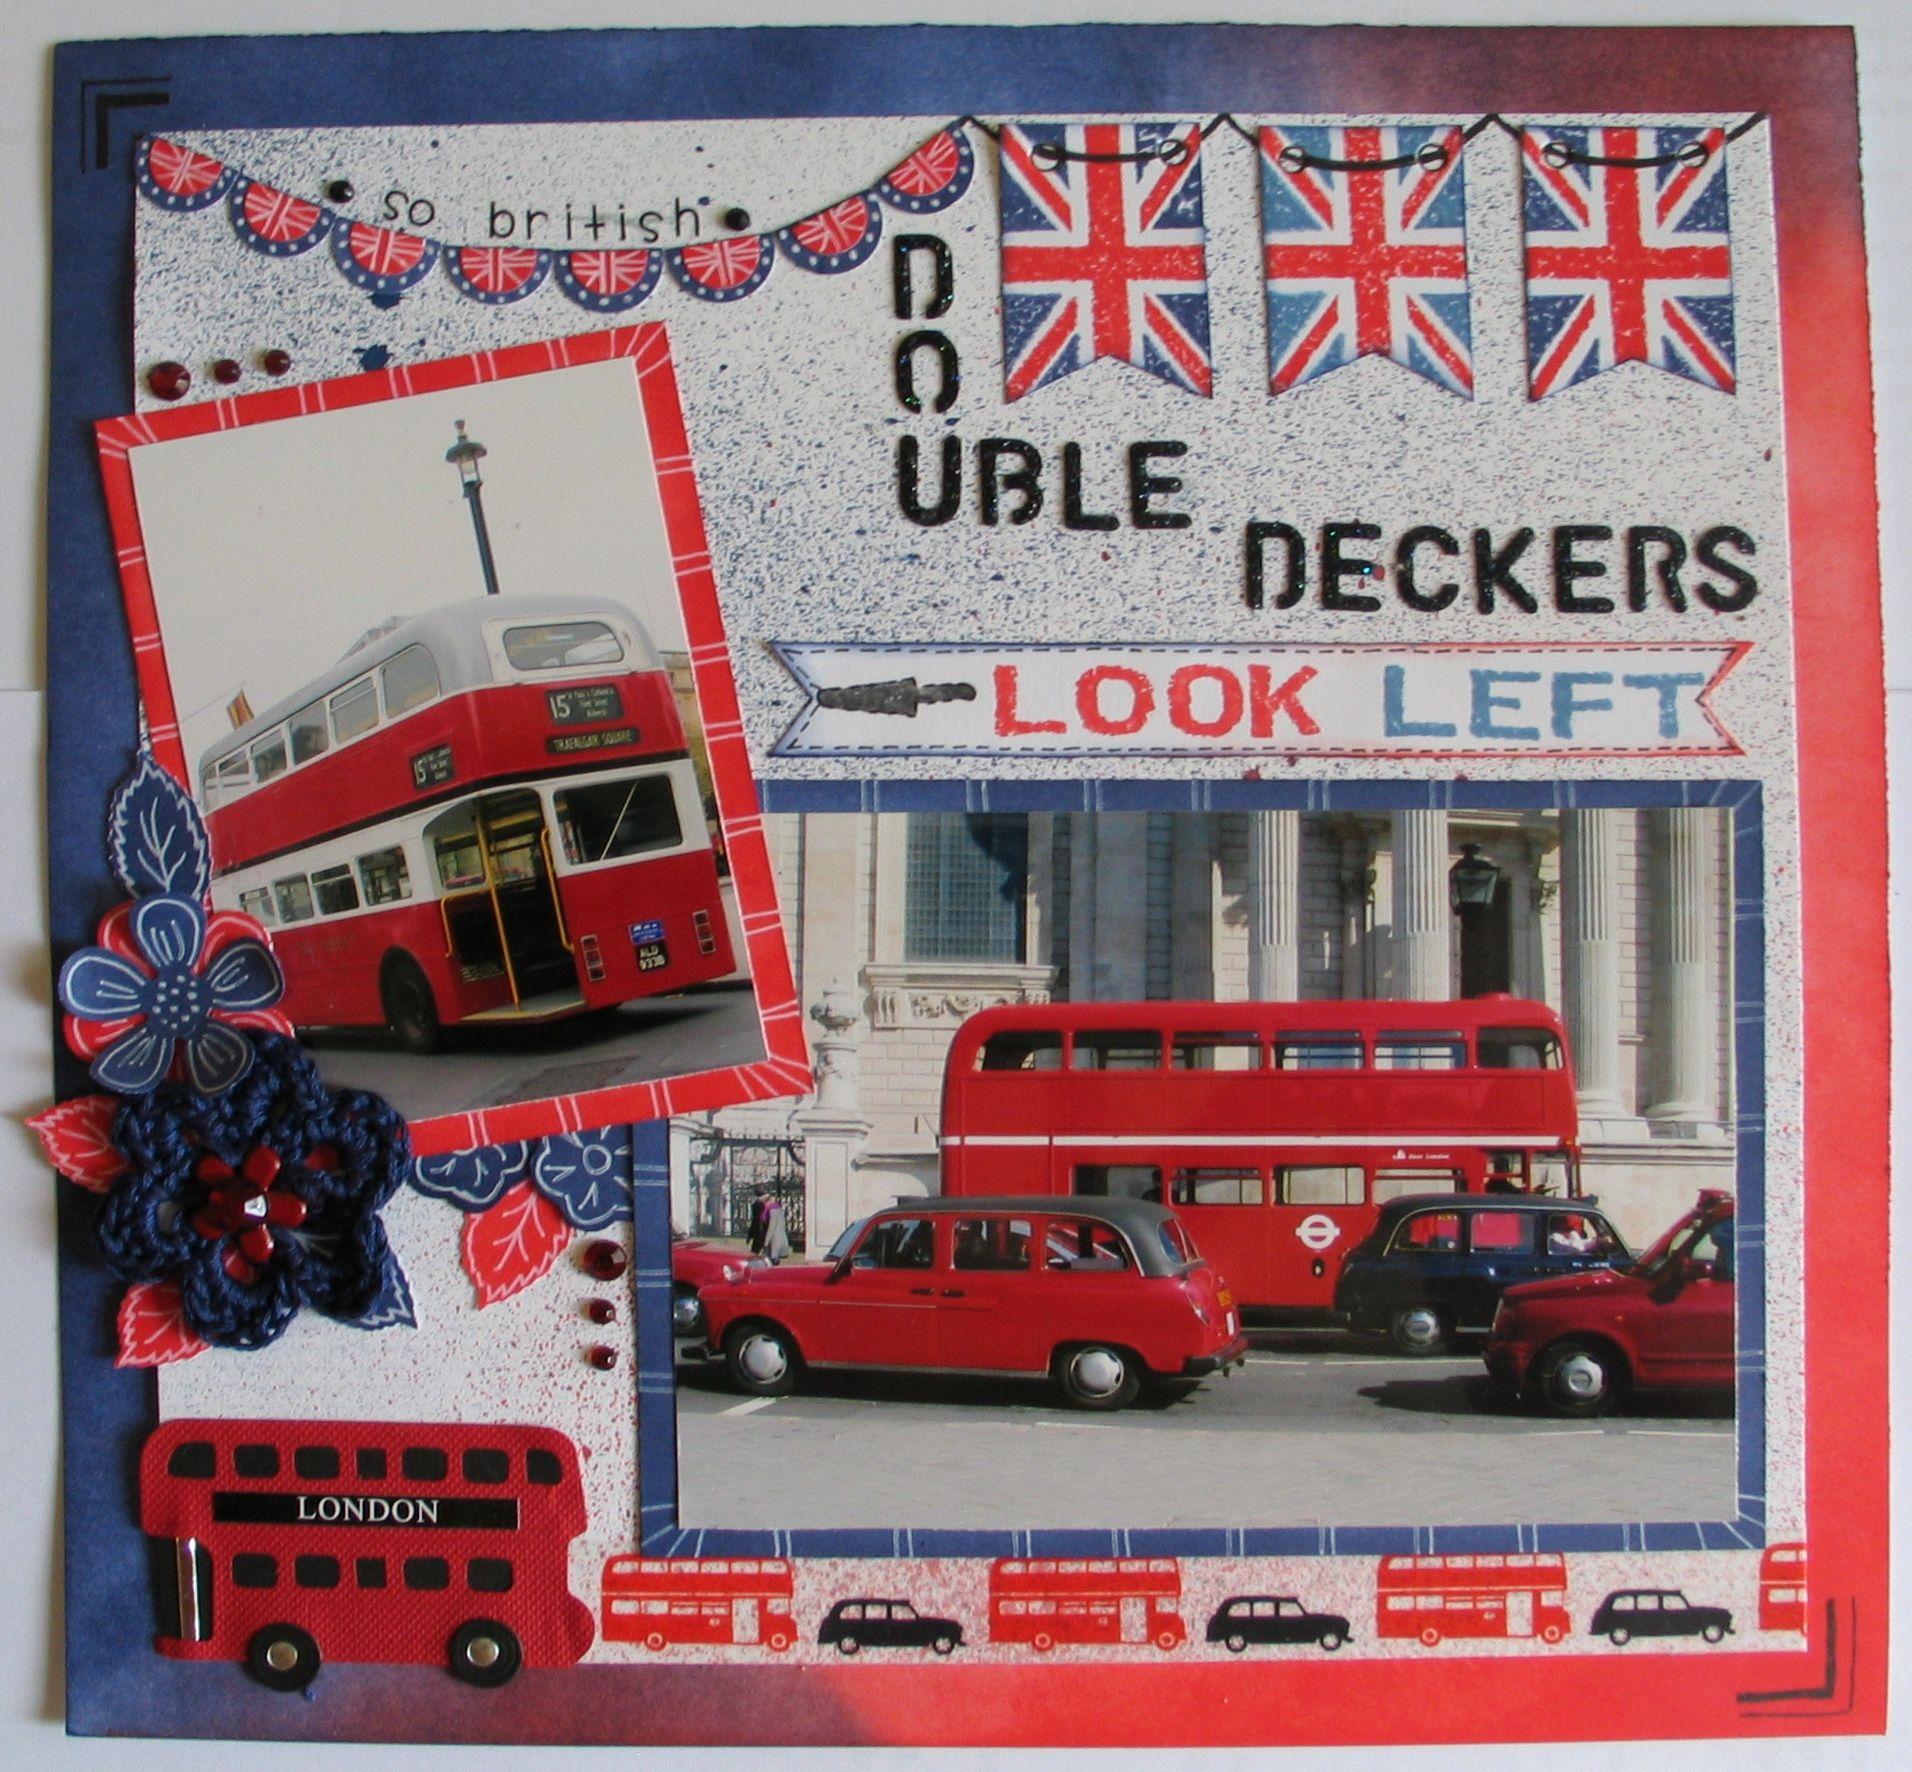 Europe scrapbook ideas - 1000 Images About Scrapbooking England Scotland Ireland On Pinterest England London England And Valparaiso